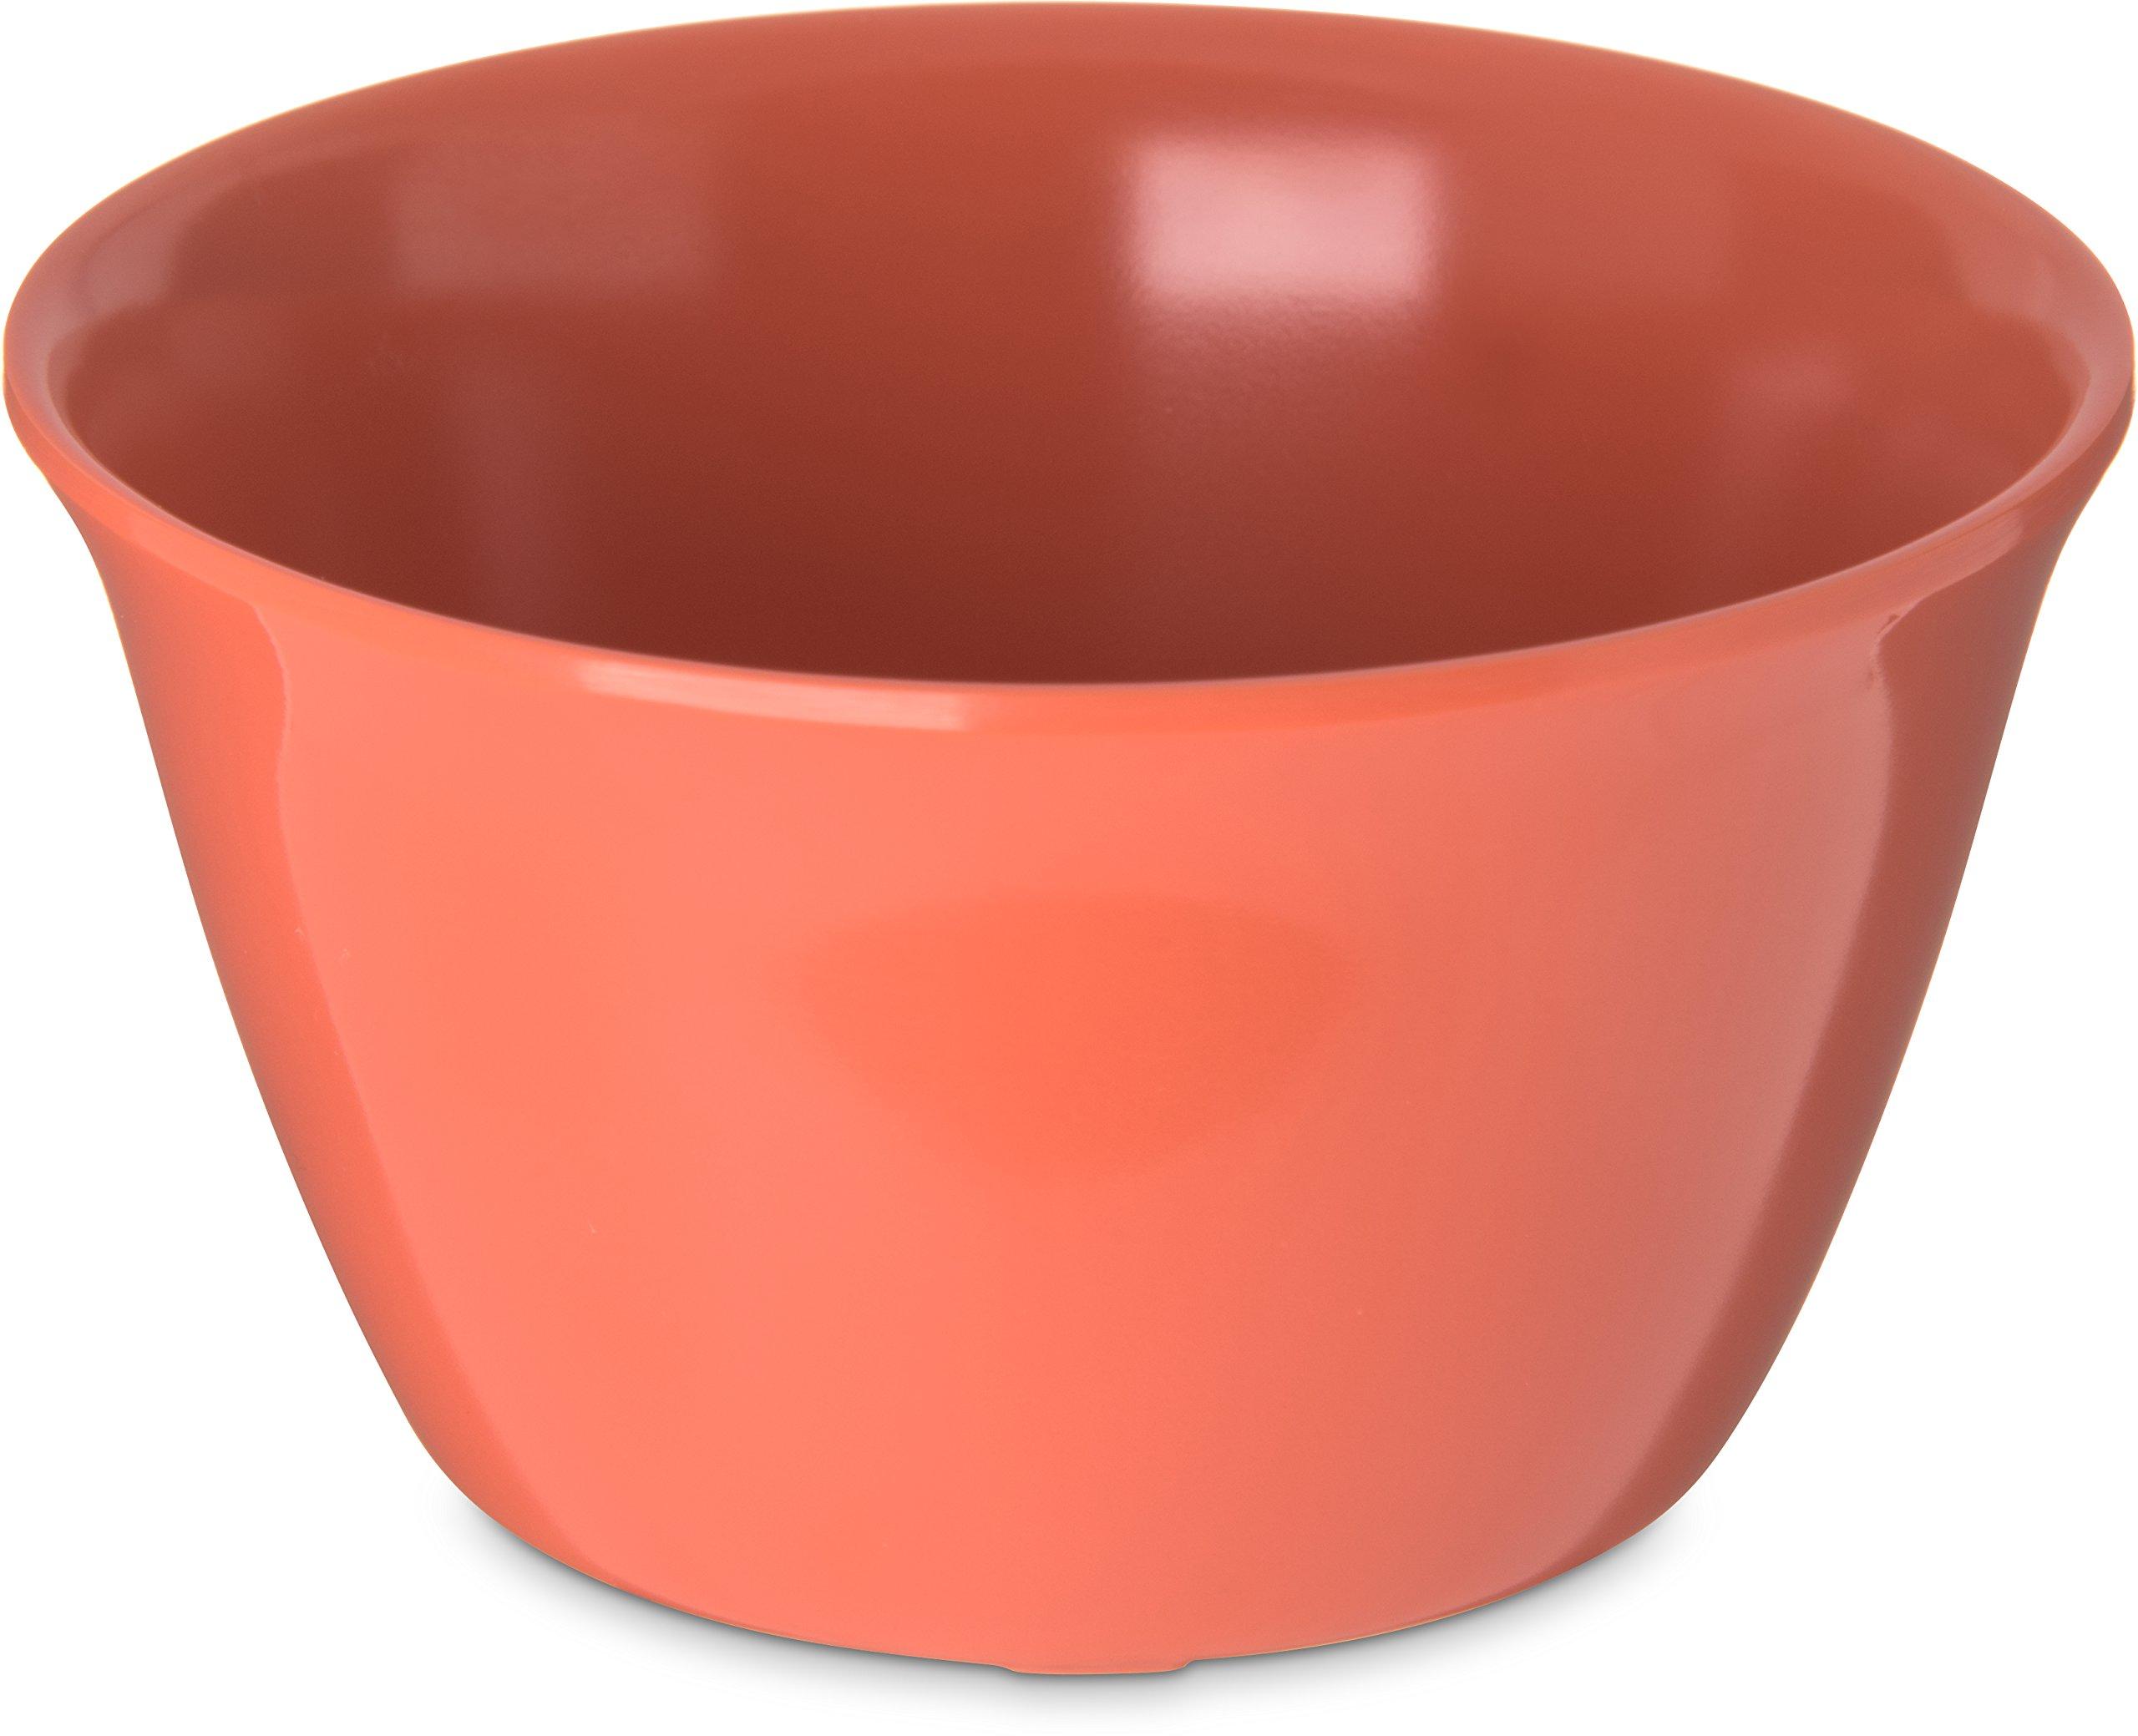 Carlisle 4354052 Dallas Ware Melamine Bouillon Cup, 8-oz. Capacity, 3.84 x 2.15'', Sunset Orange (Case of 24)